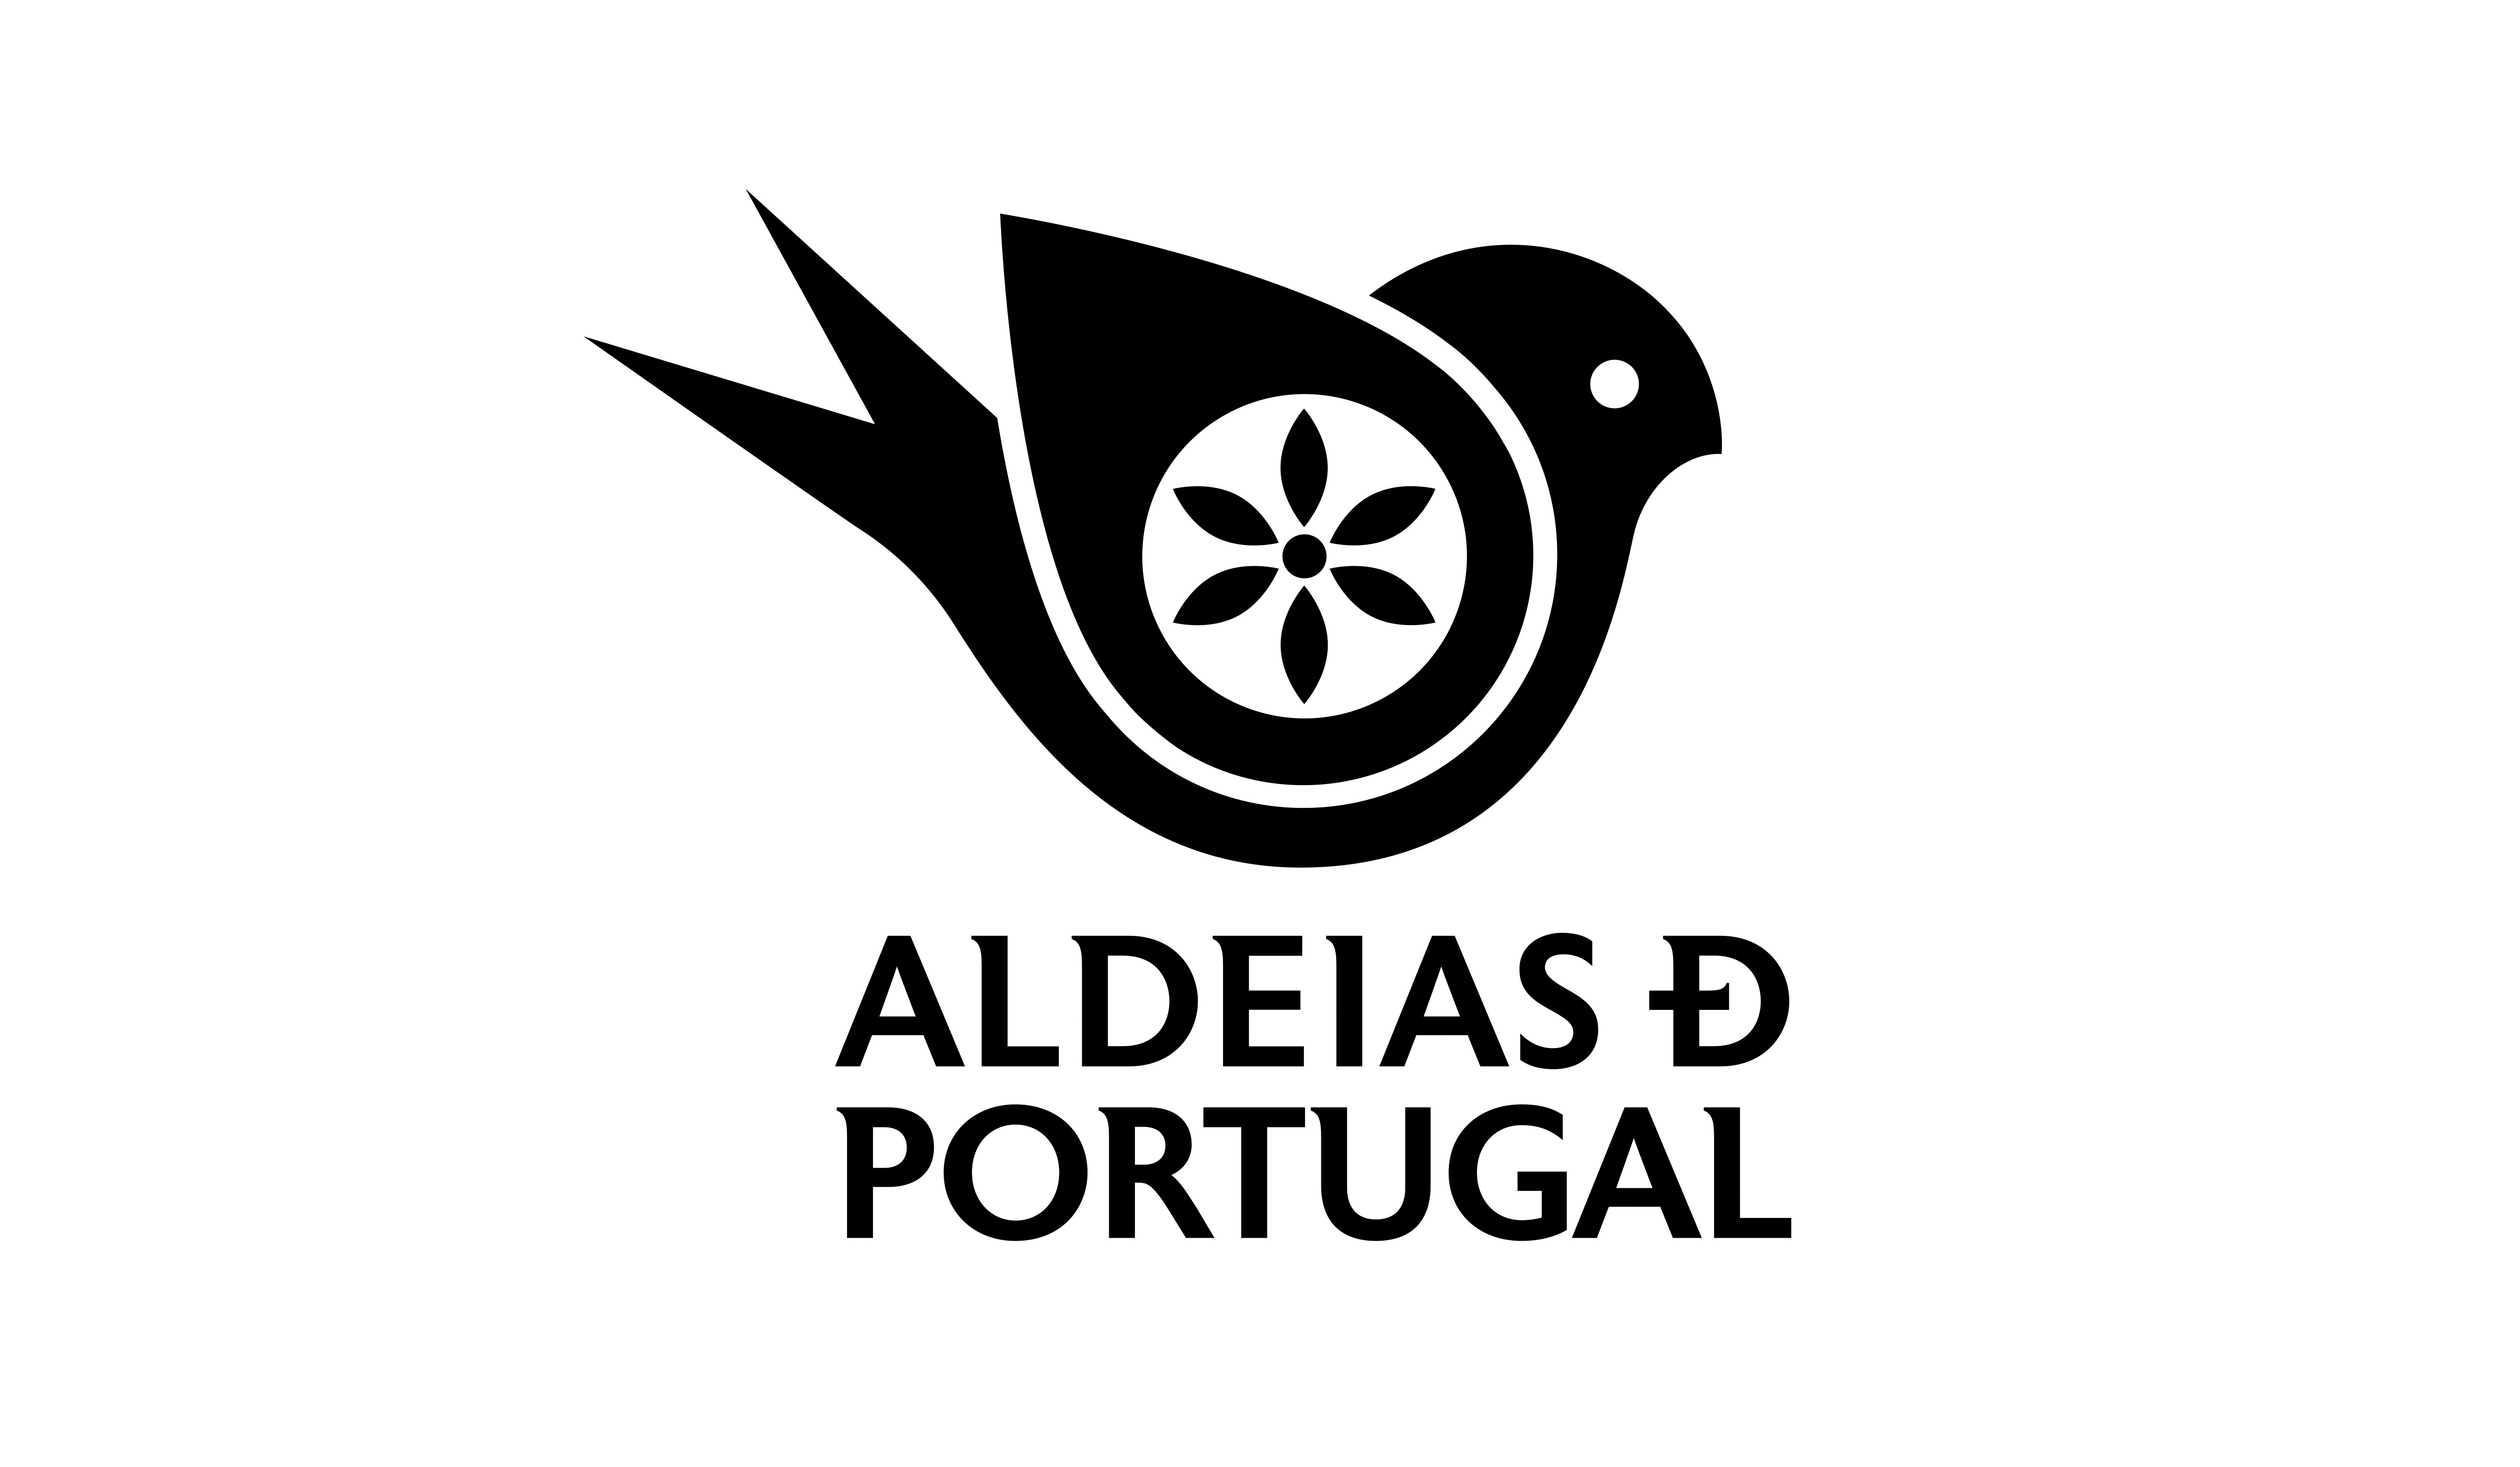 Aldeias de Portugal by Paulo Marcelo - Creative Work - $i